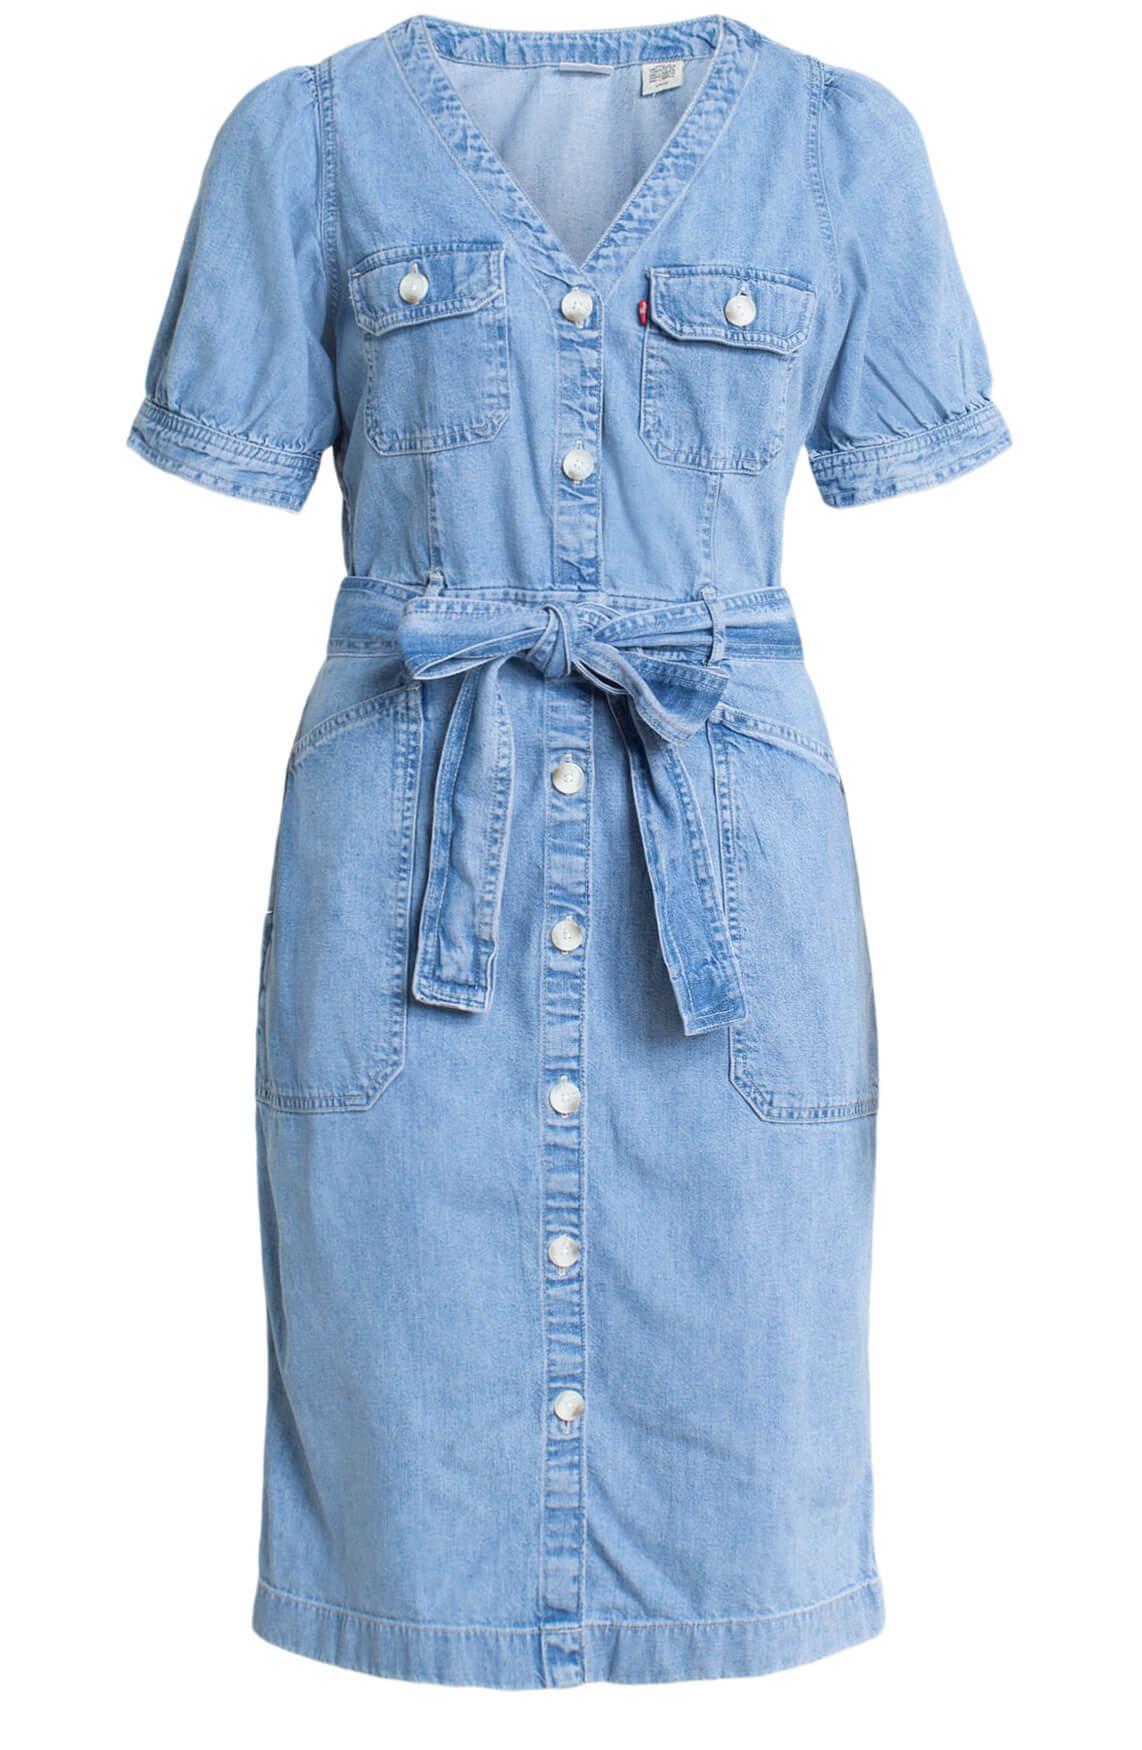 Levi s Dames Denim jurk Blauw